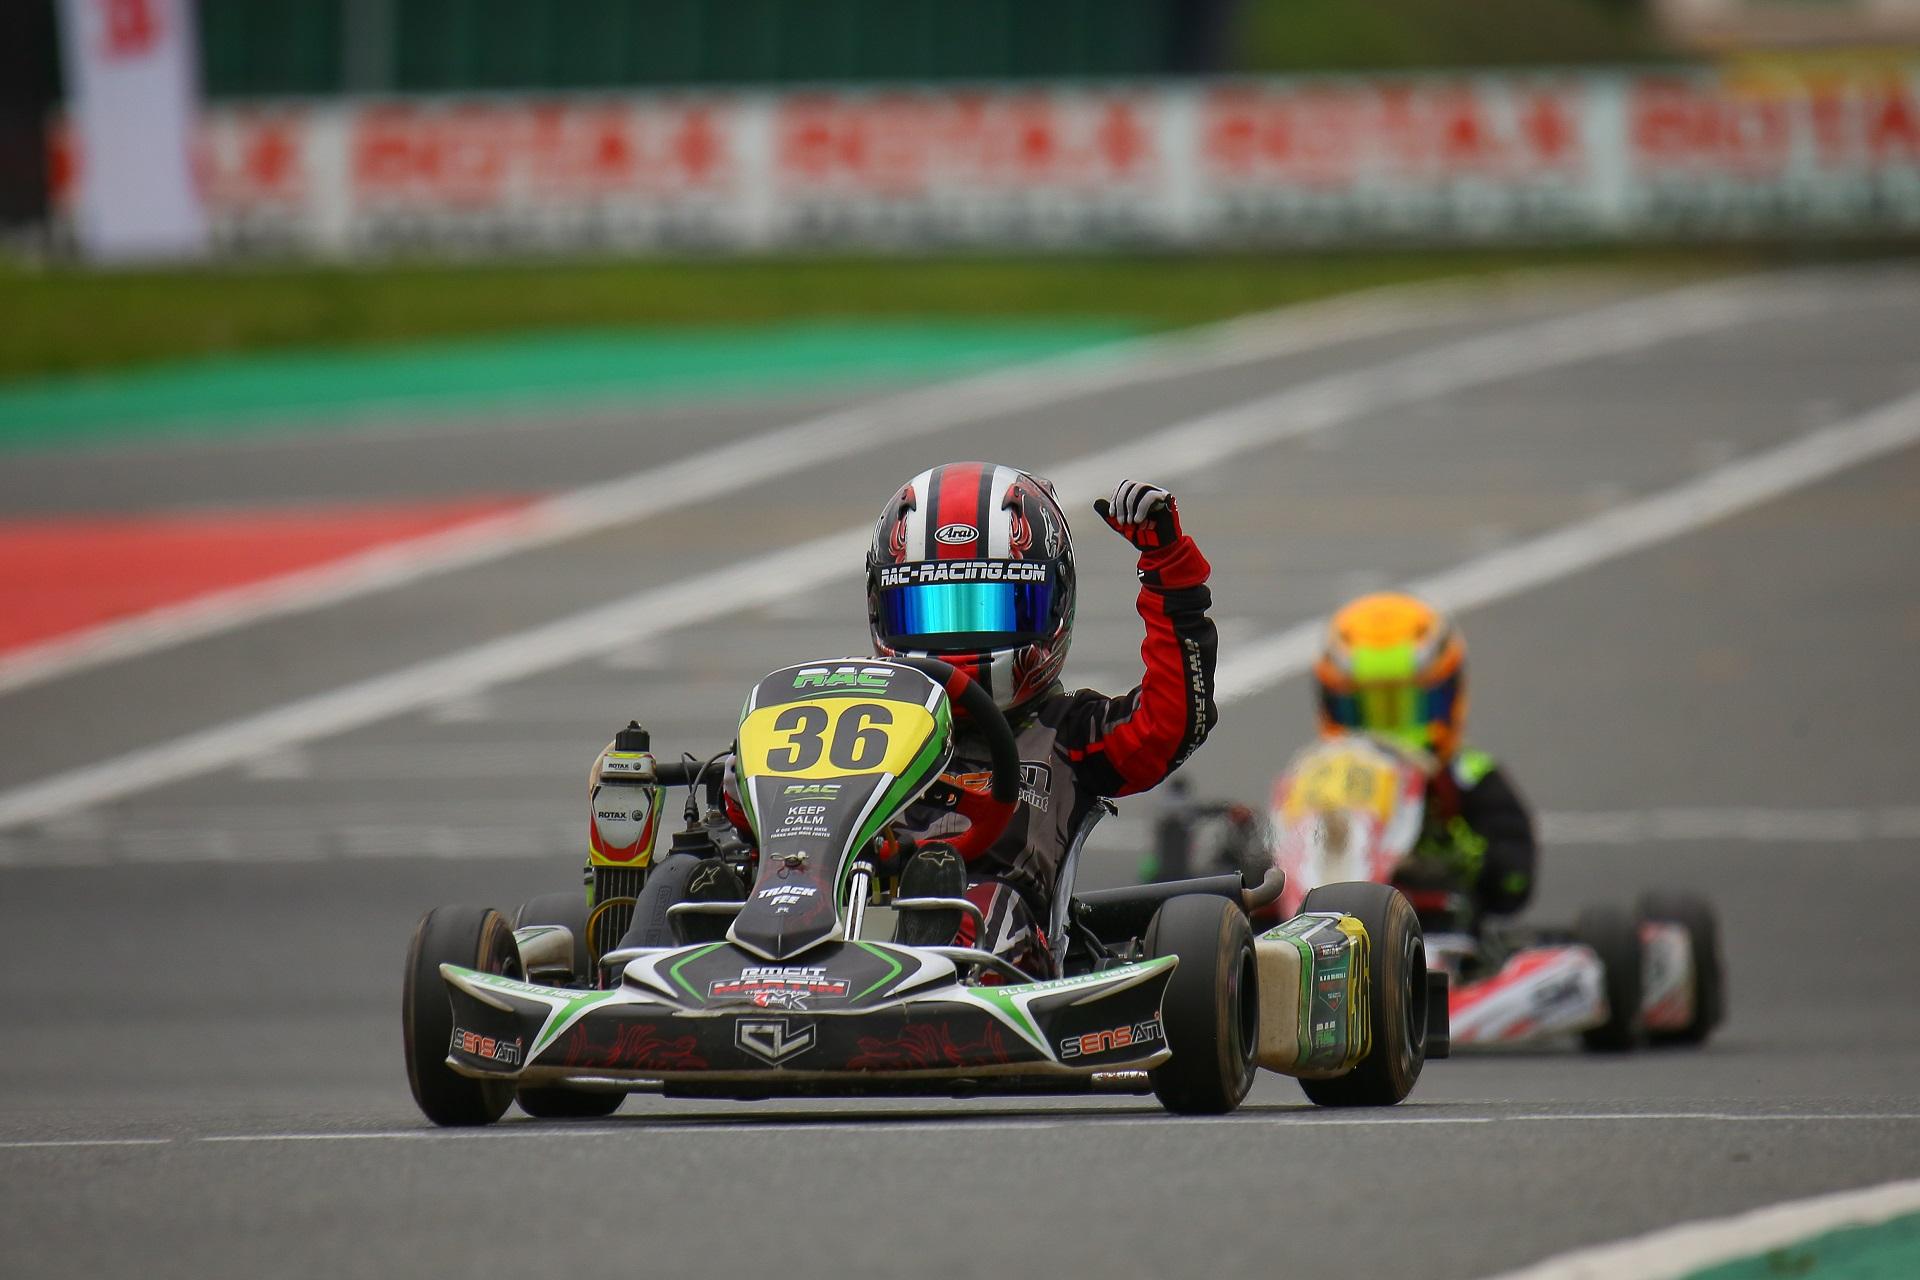 Martim Marques 7.º classificado na Final do Rotax International Trophy Micro-Max